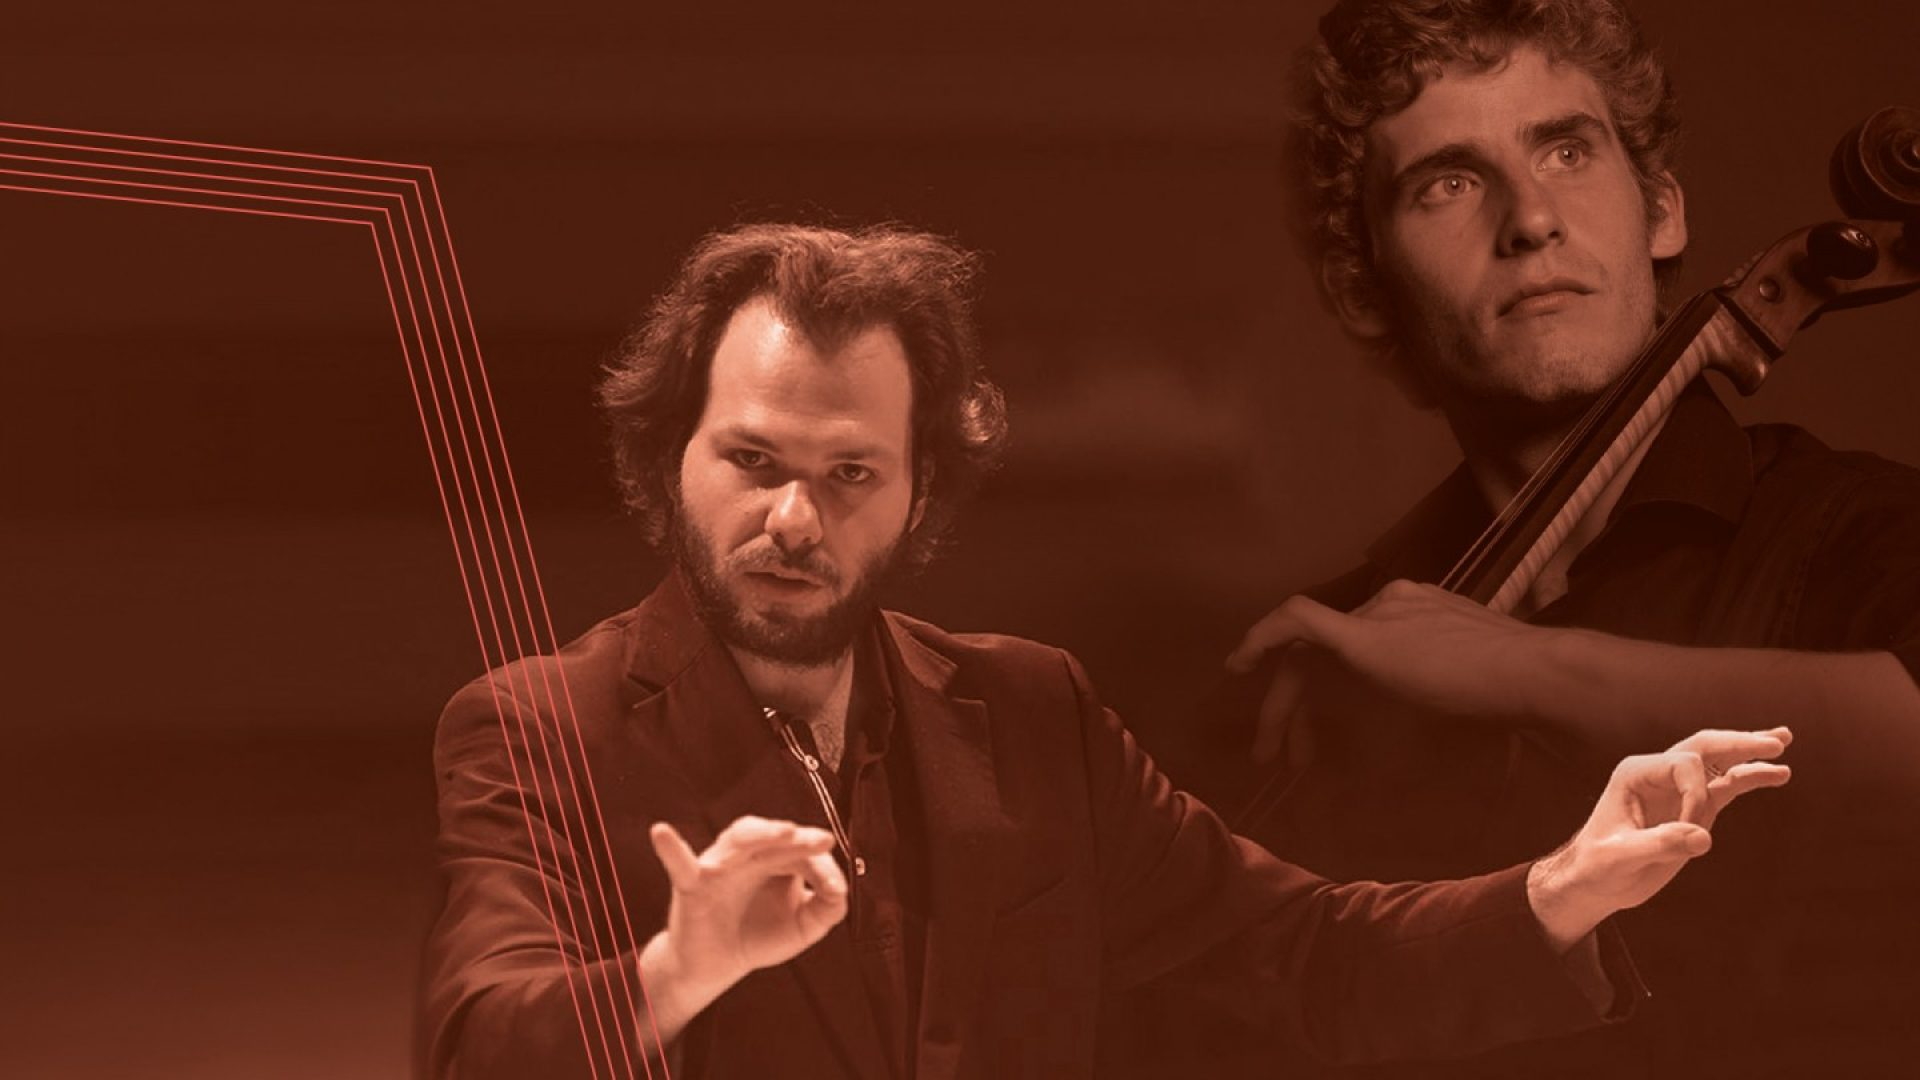 Dirigent Petr Popelka og cellosolist Andreas Brantelid